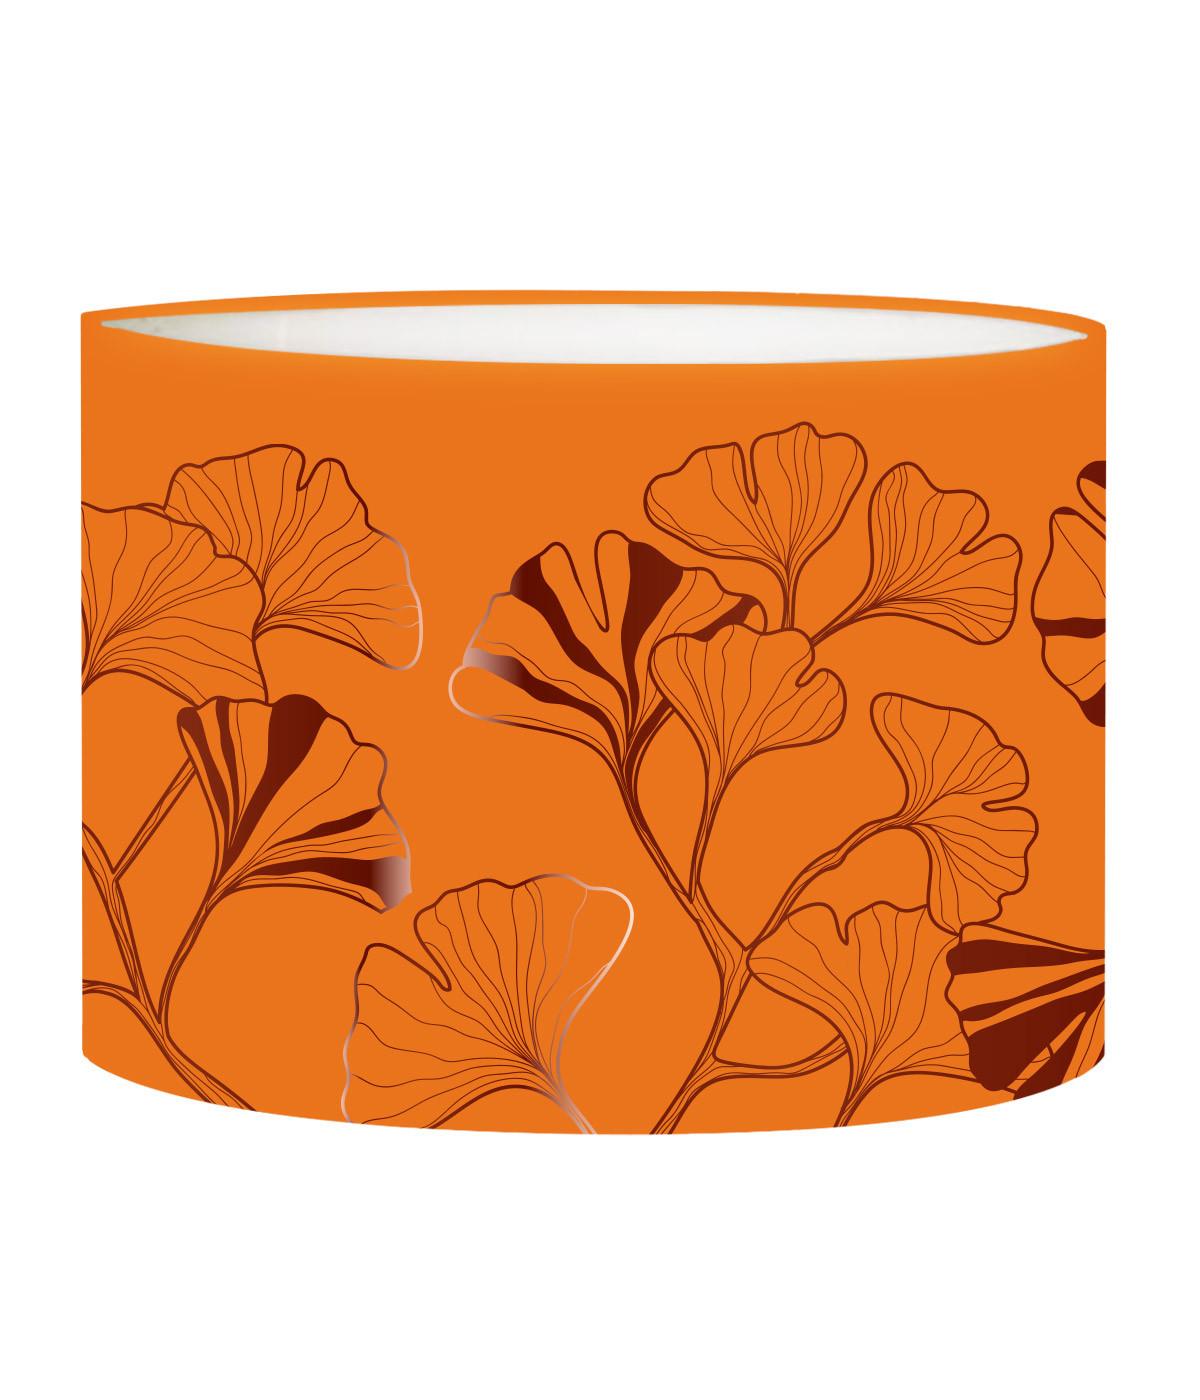 Abat-jour Lampadaire Iris Mandarine D 45 x H 25